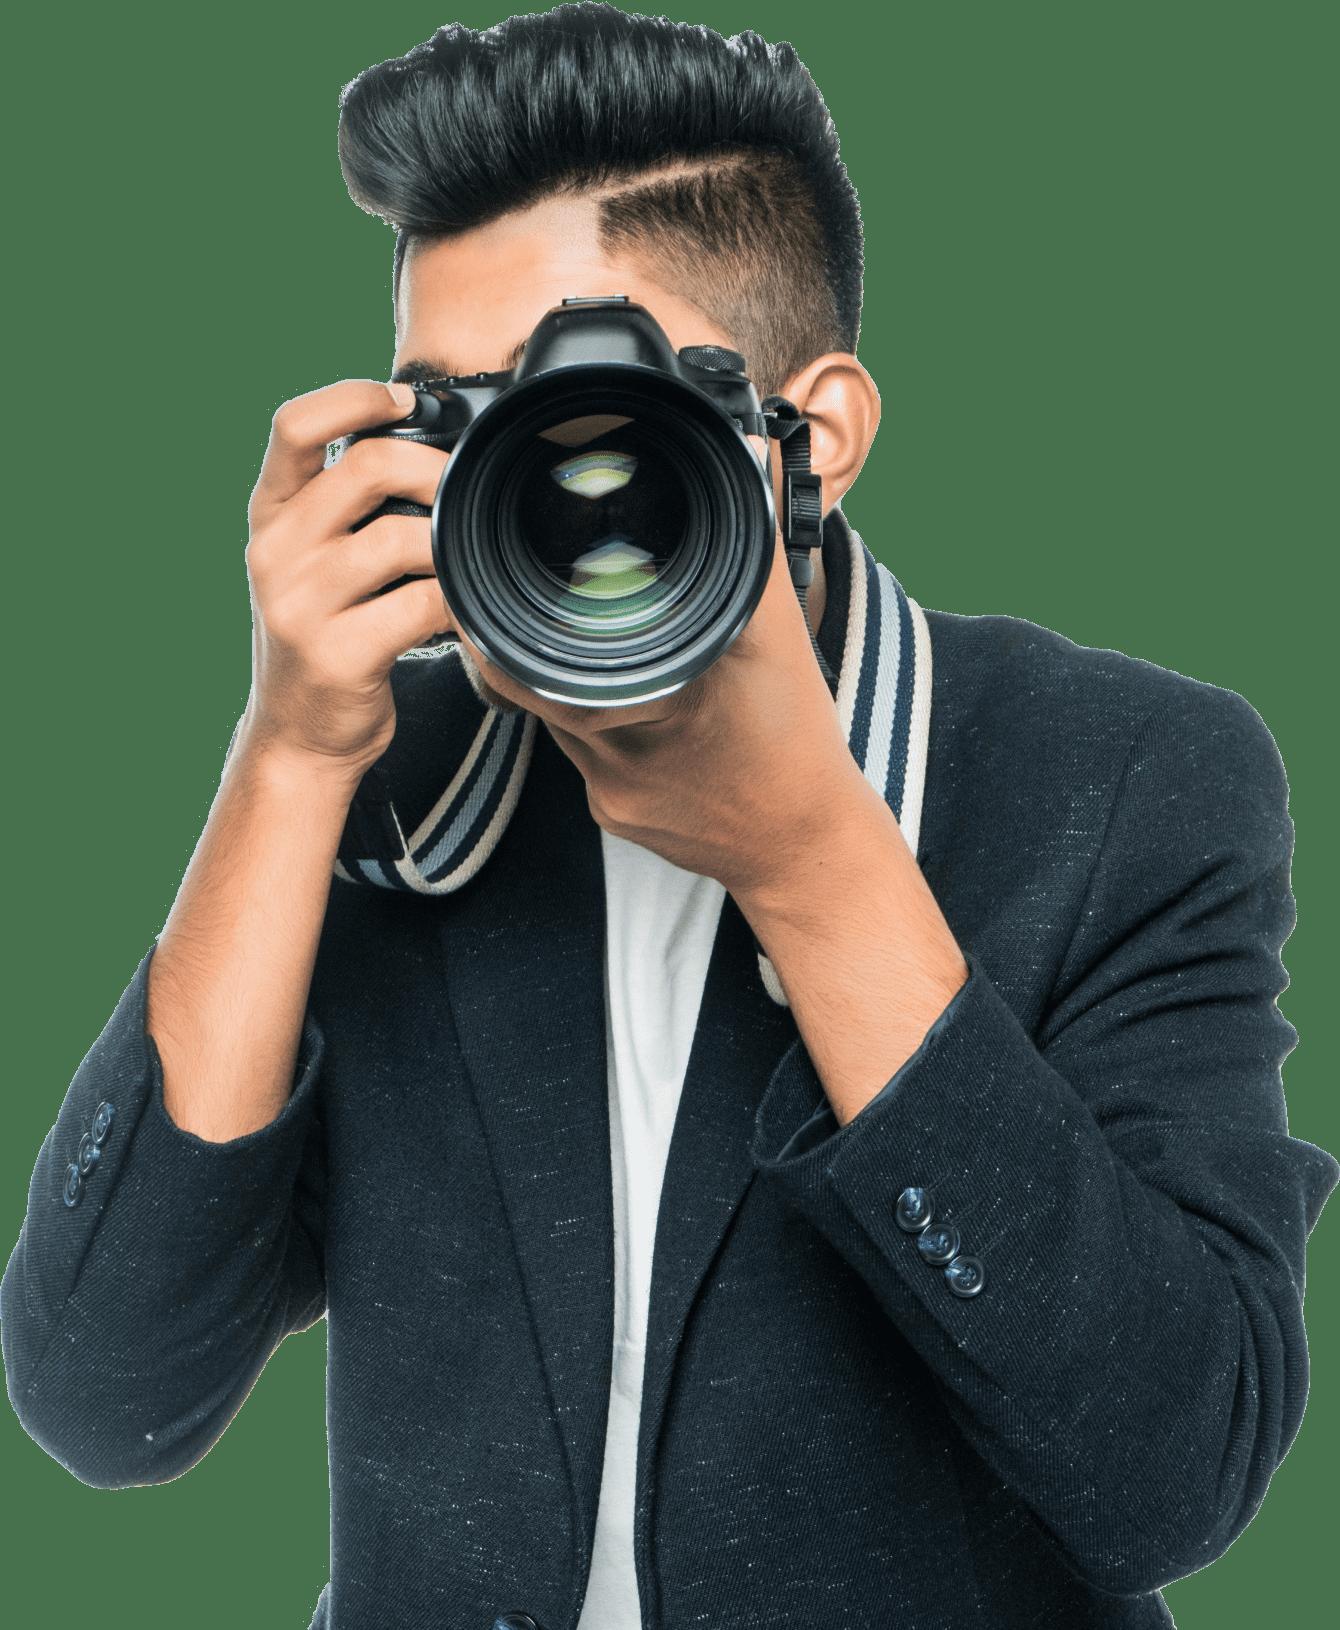 photograpge